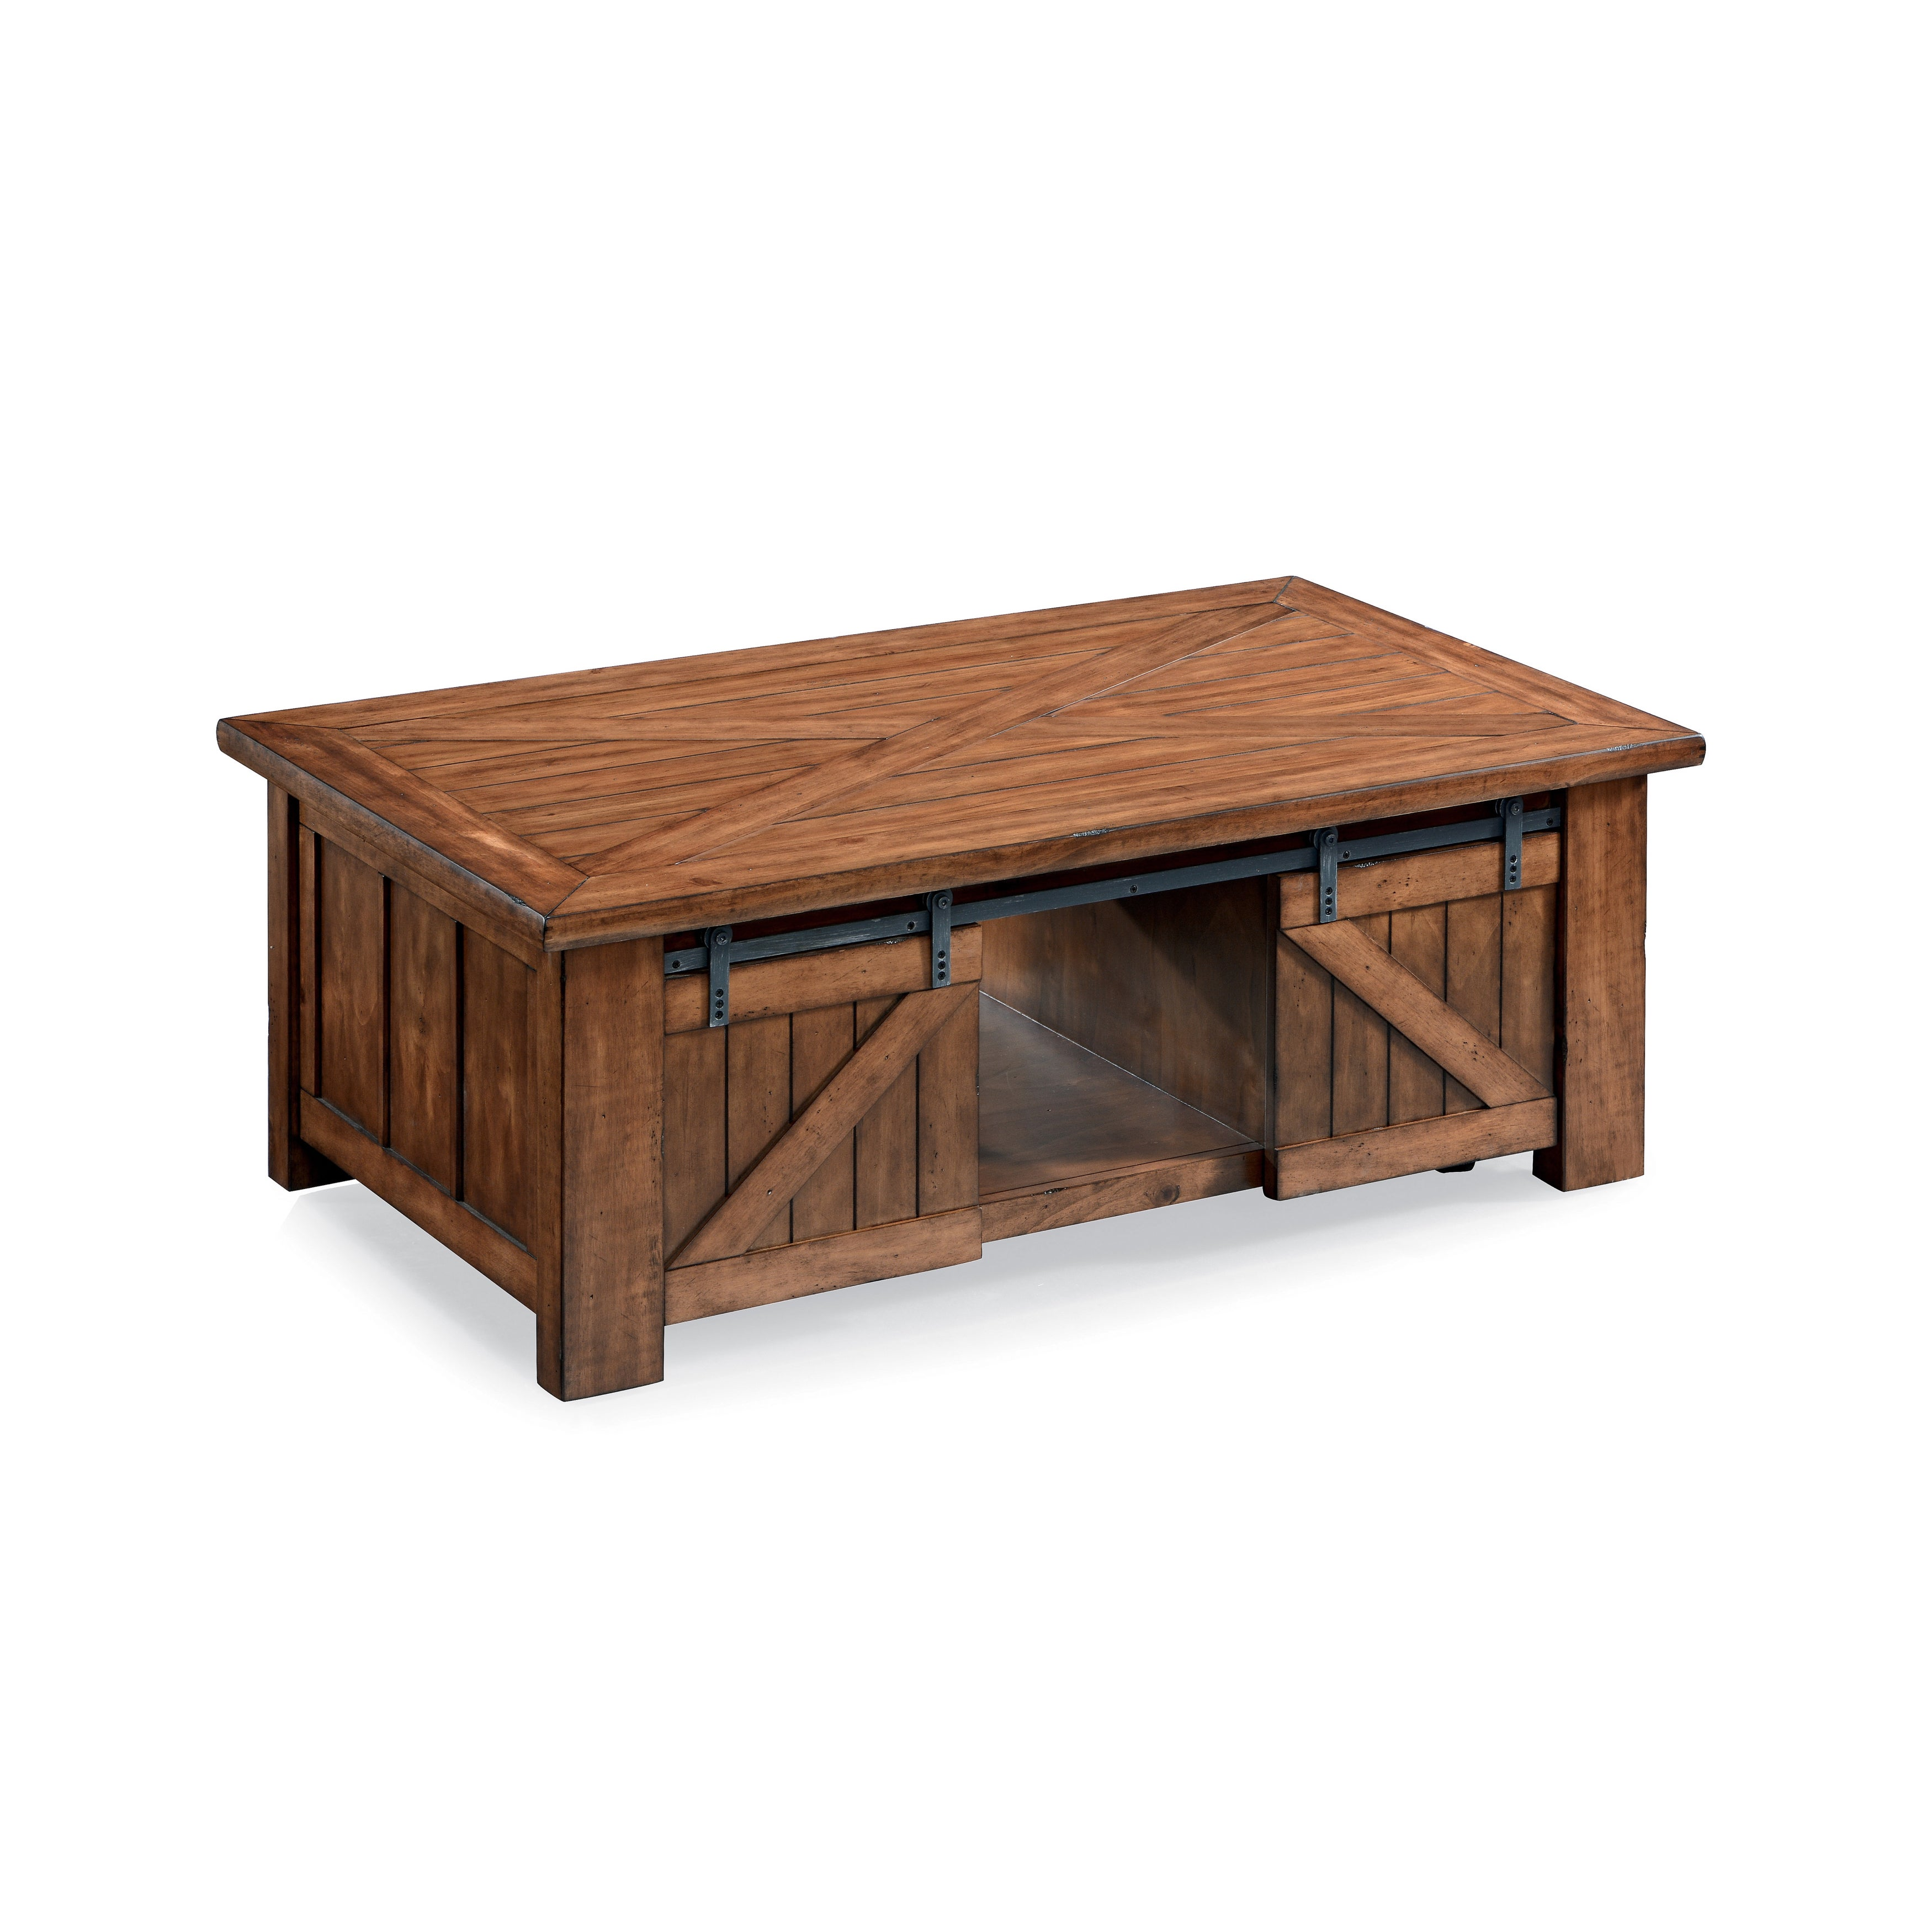 Harper Farm Rustic Warm Pine Lift Top Sliding Door Coffee Table On Casters Overstock 13321538